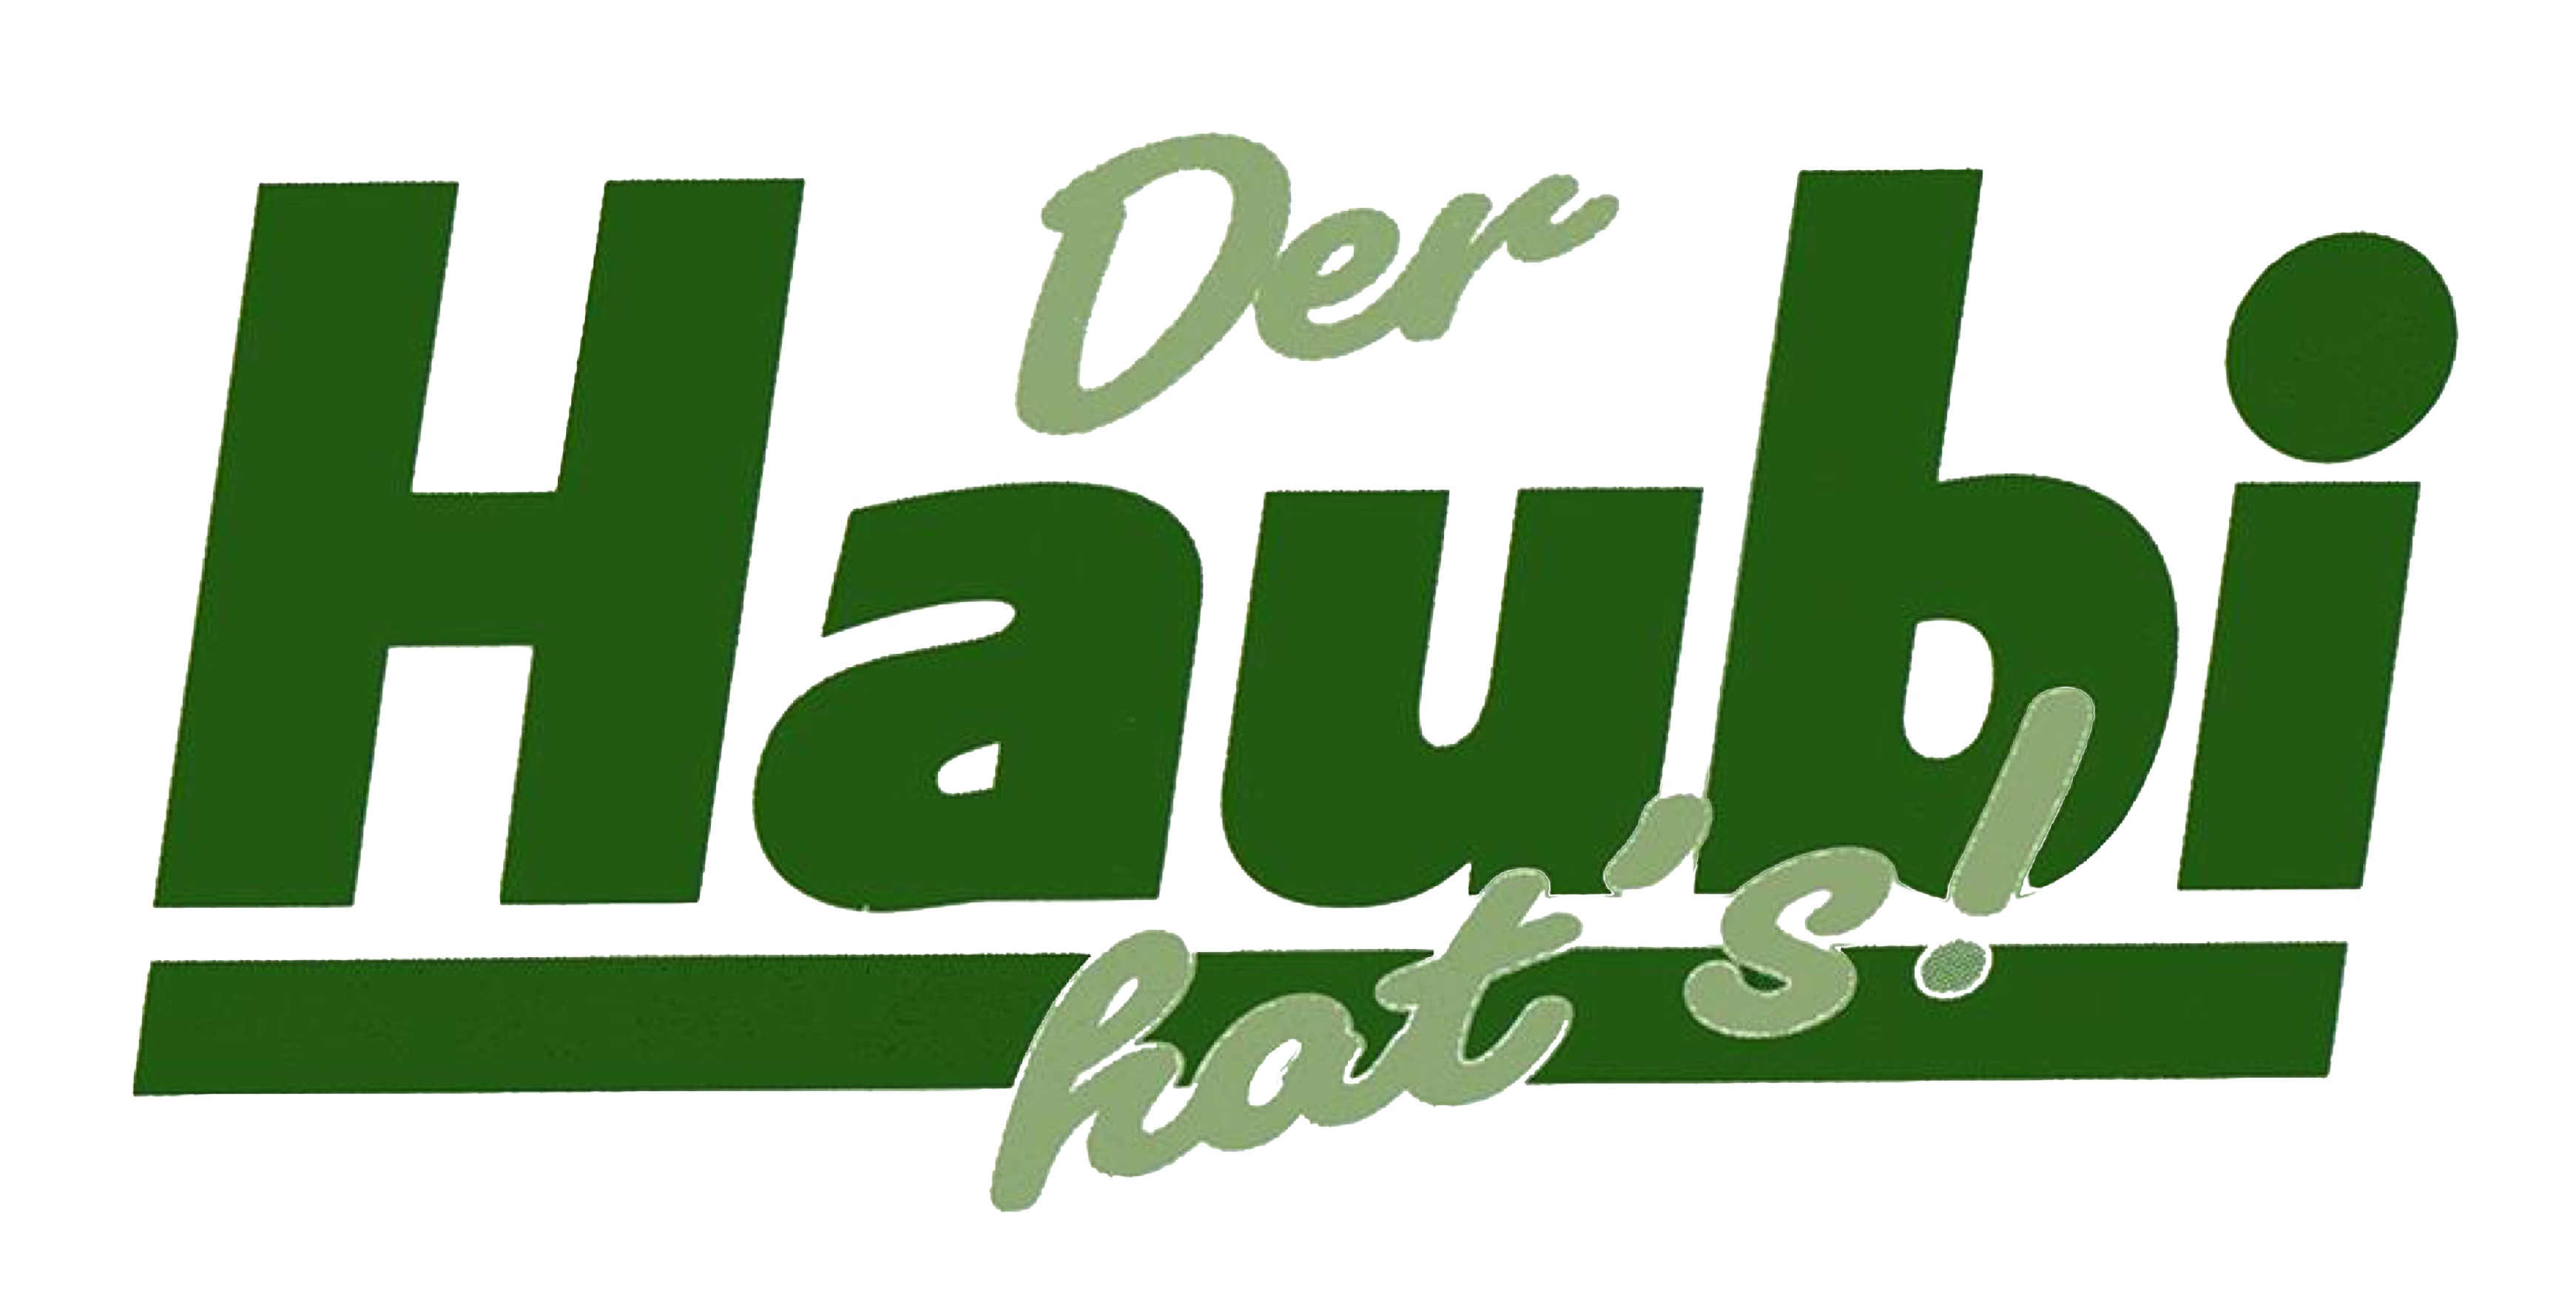 Haubenwallner Gols - Der Haubi hat´s!